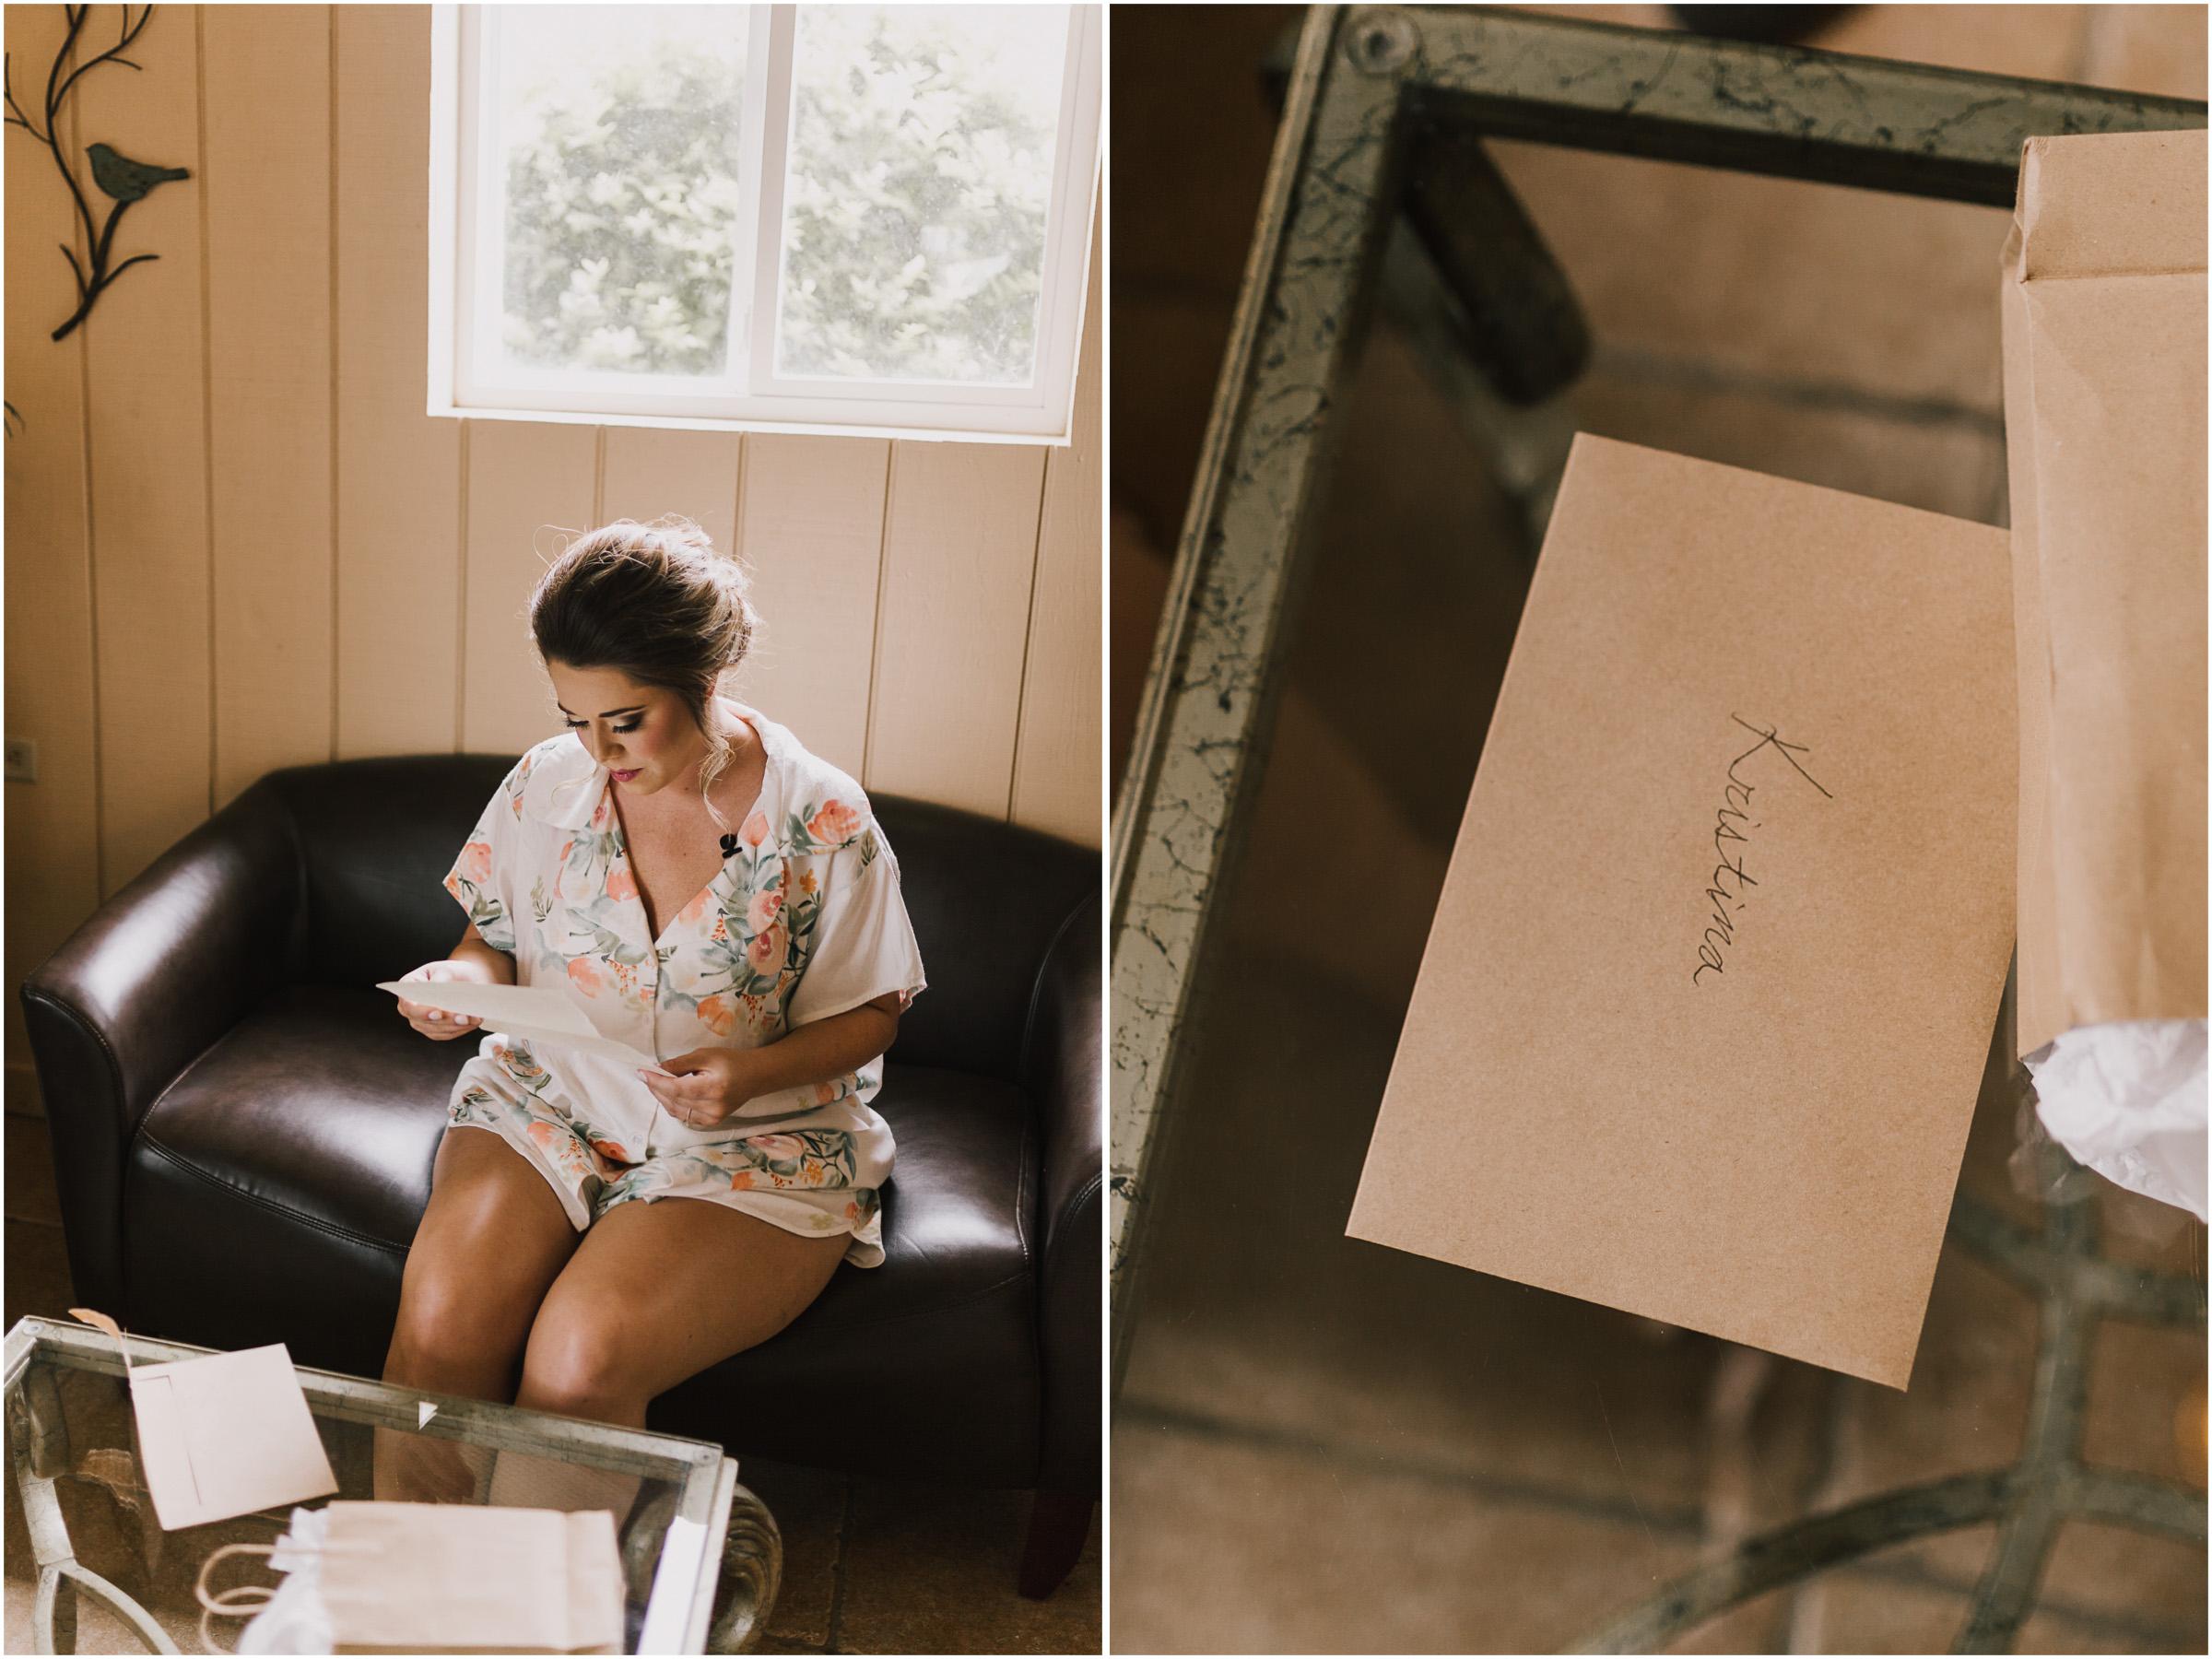 alyssa barletter photography summer odessa missouri wedding kansas city photographer-7.jpg